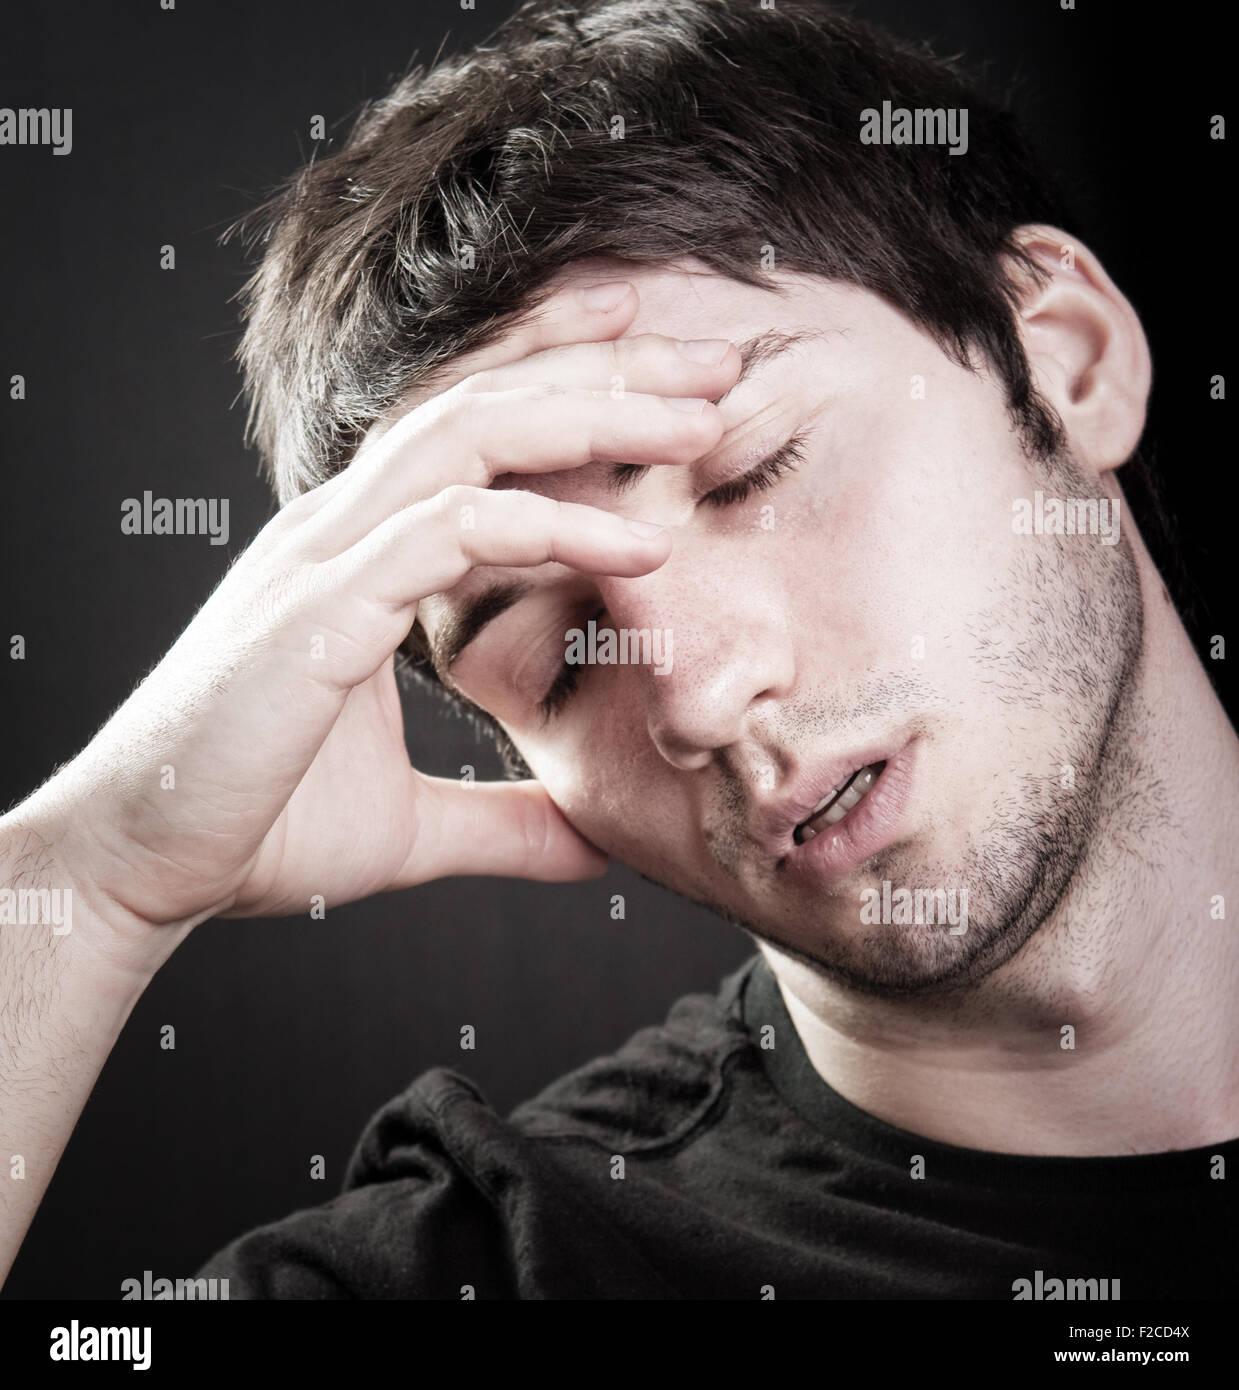 Depression concept - sad young man over black - Stock Image